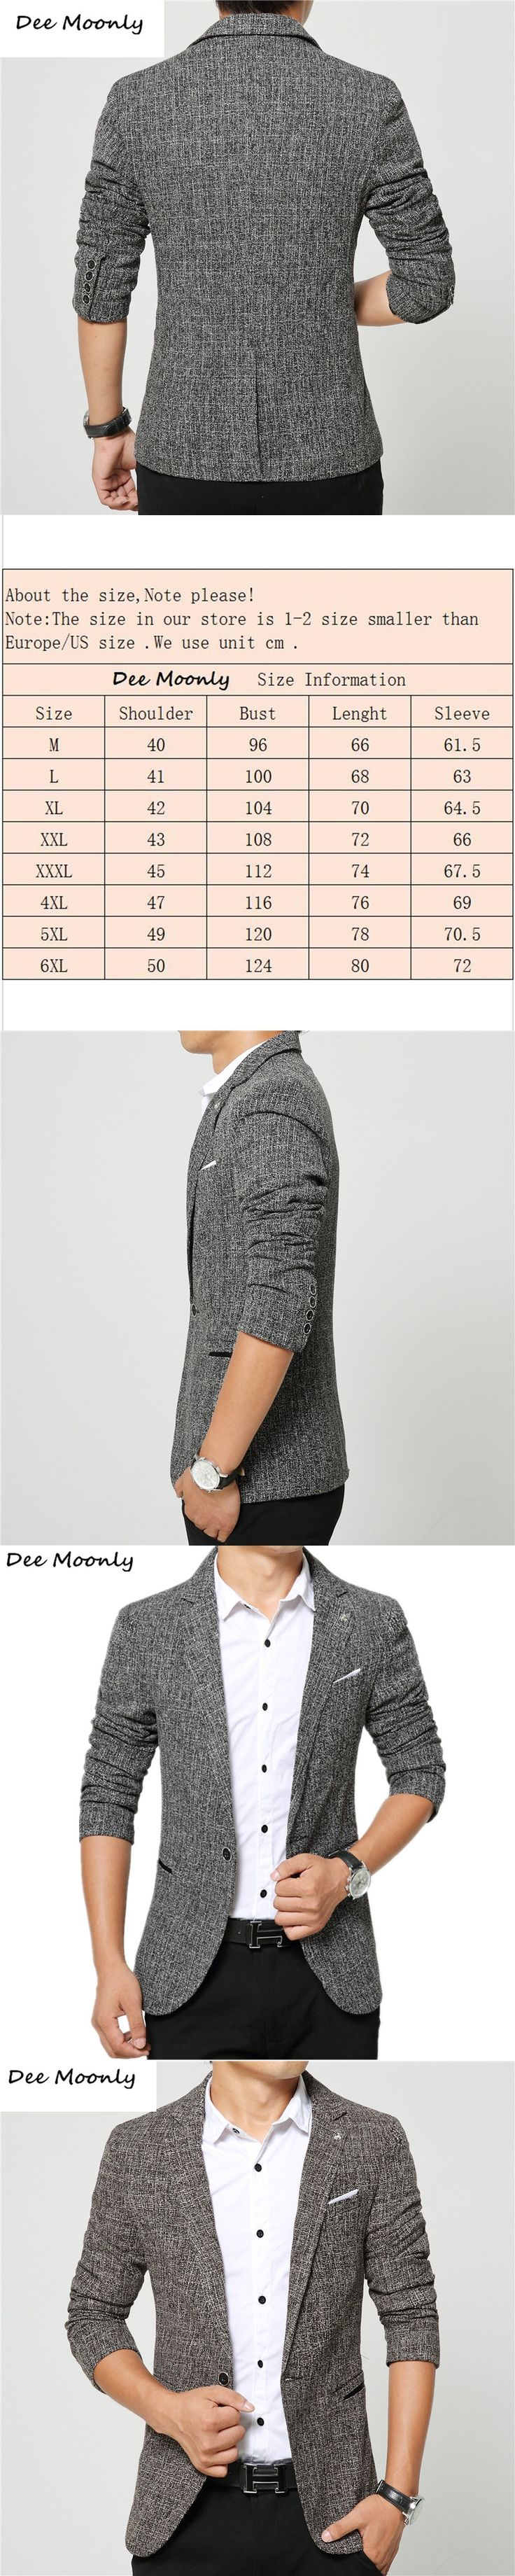 DEE MOONLY 2017 Men Blazer New Suit Men 3 Colors Casual Jacket Terno Masculino Latest Coat Designs Blazers Men Clothing M-4XL